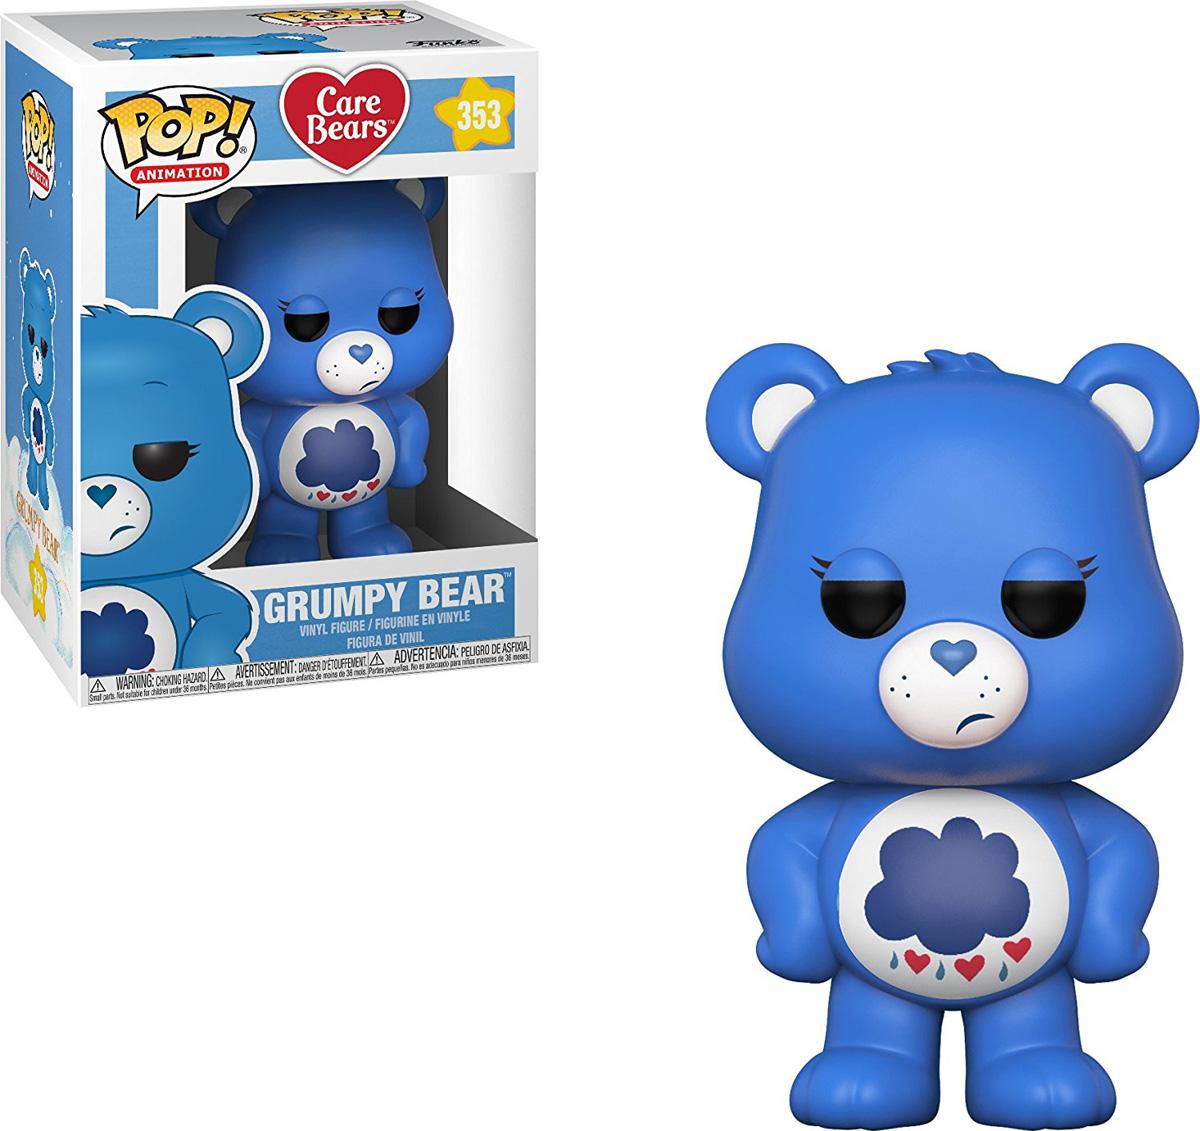 Funko POP! Vinyl Фигурка Care Bears: Grumpy Bear 26713 товары для праздника care bears набор свечей заботливые мишки